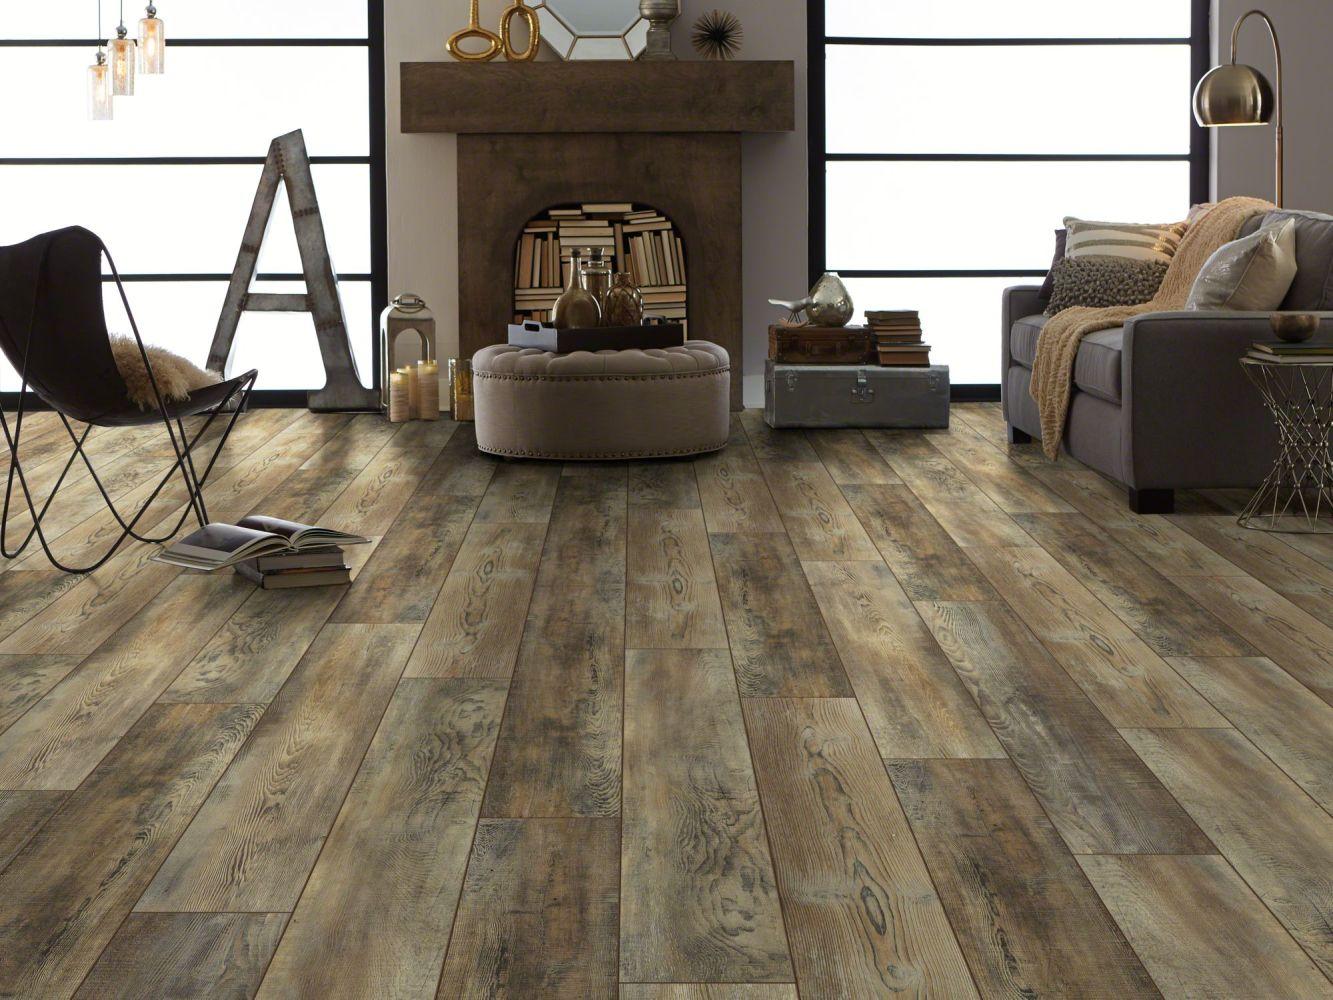 Shaw Floors Resilient Residential Pearsoll Plus Saggio 00159_HSS49